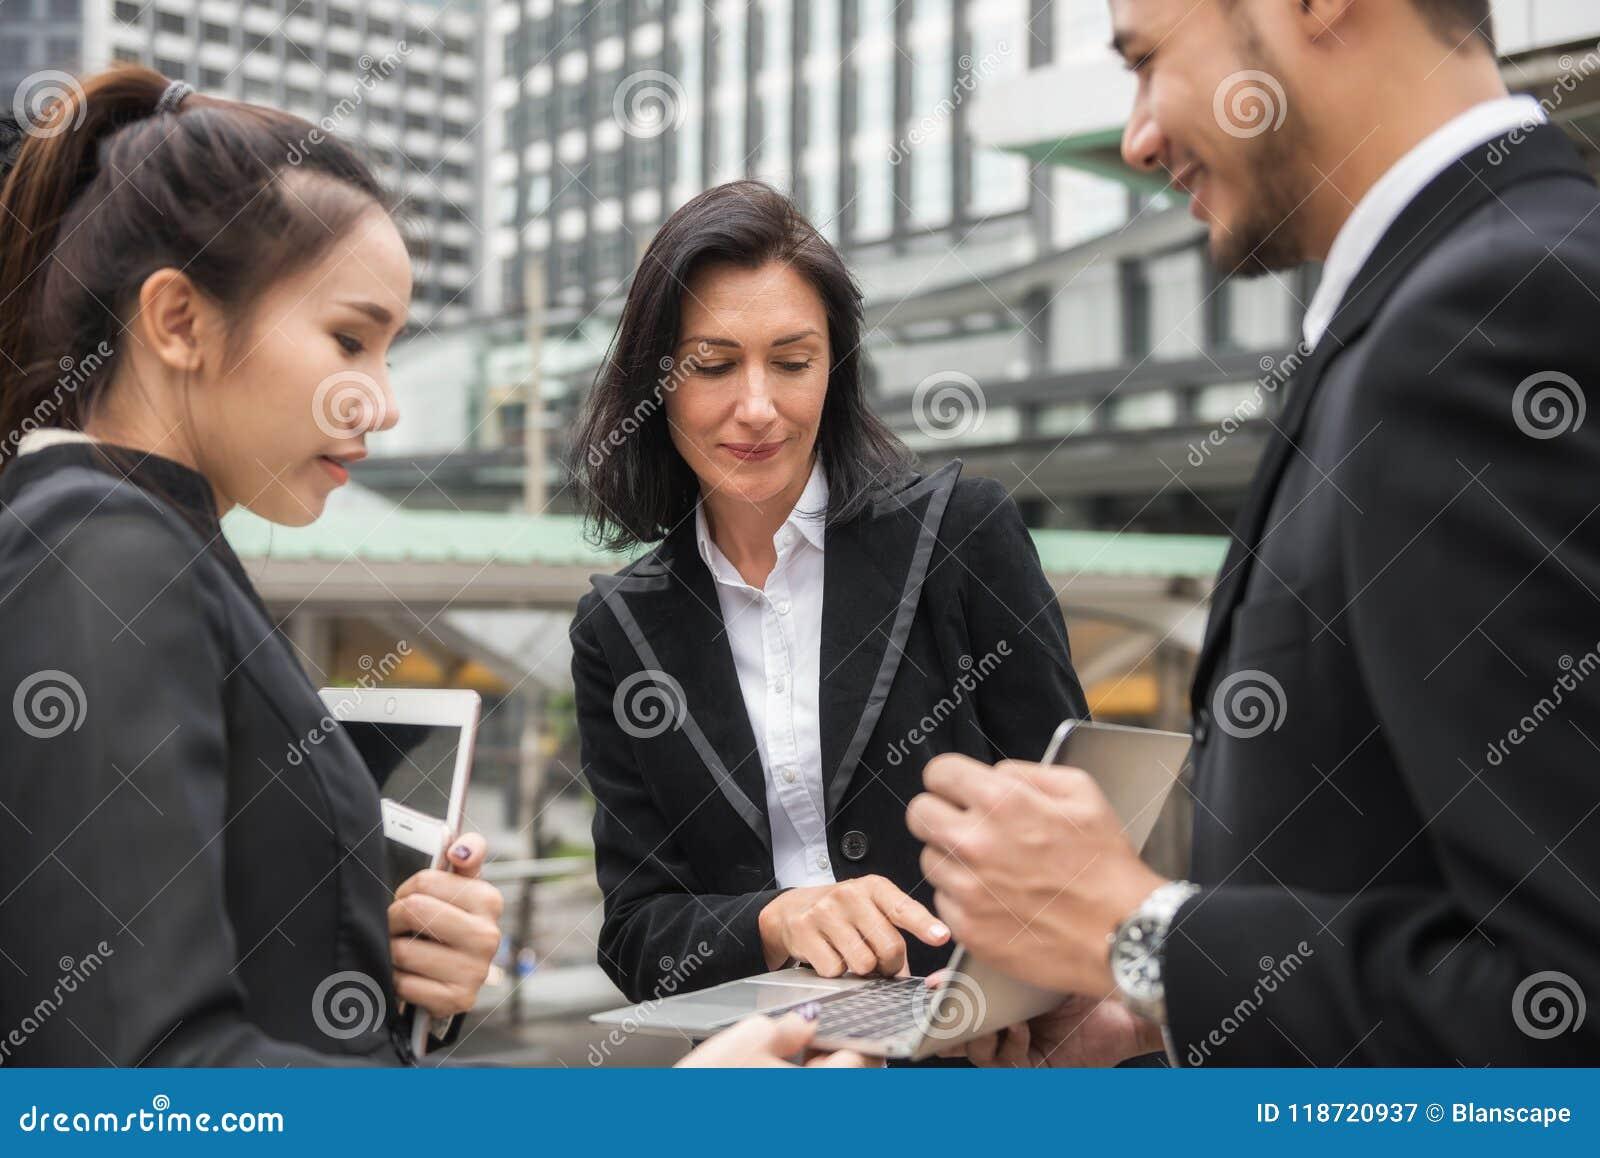 Teanwork brainstorm business idea in city